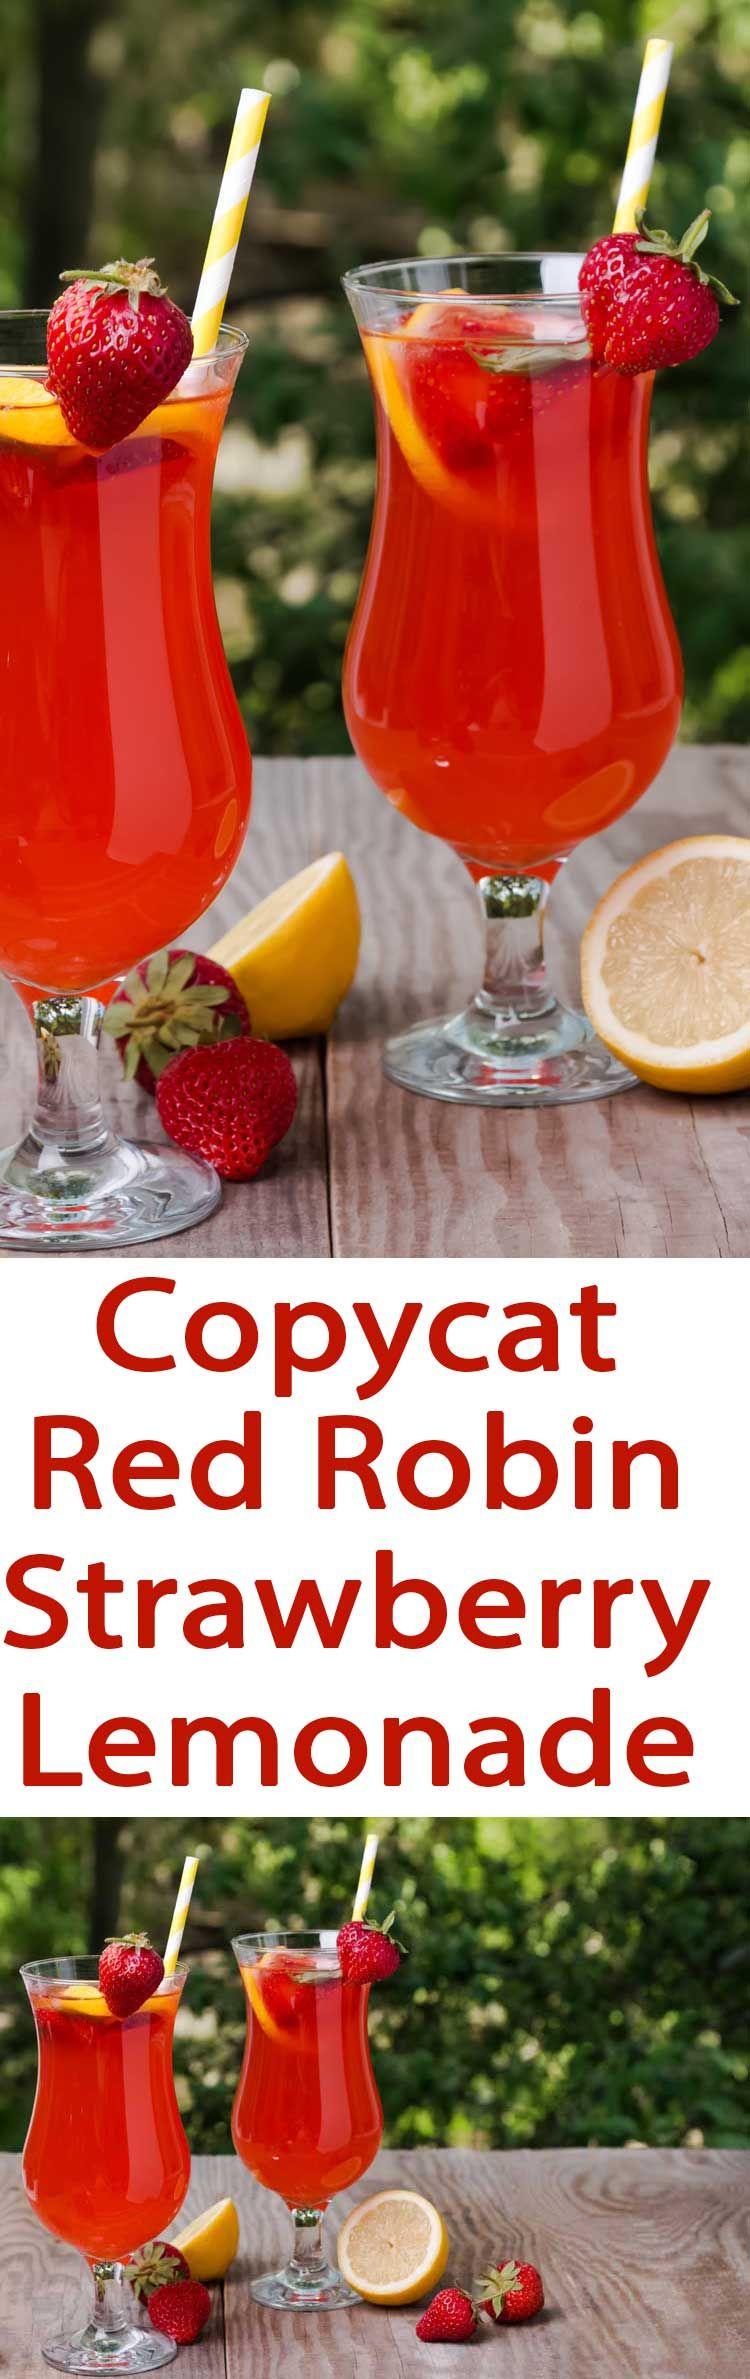 Copycat Red Robin Strawberry Lemonade All She Cooks Strawberry Lemonade Recipe Fruity Drink Recipes Fruity Drinks